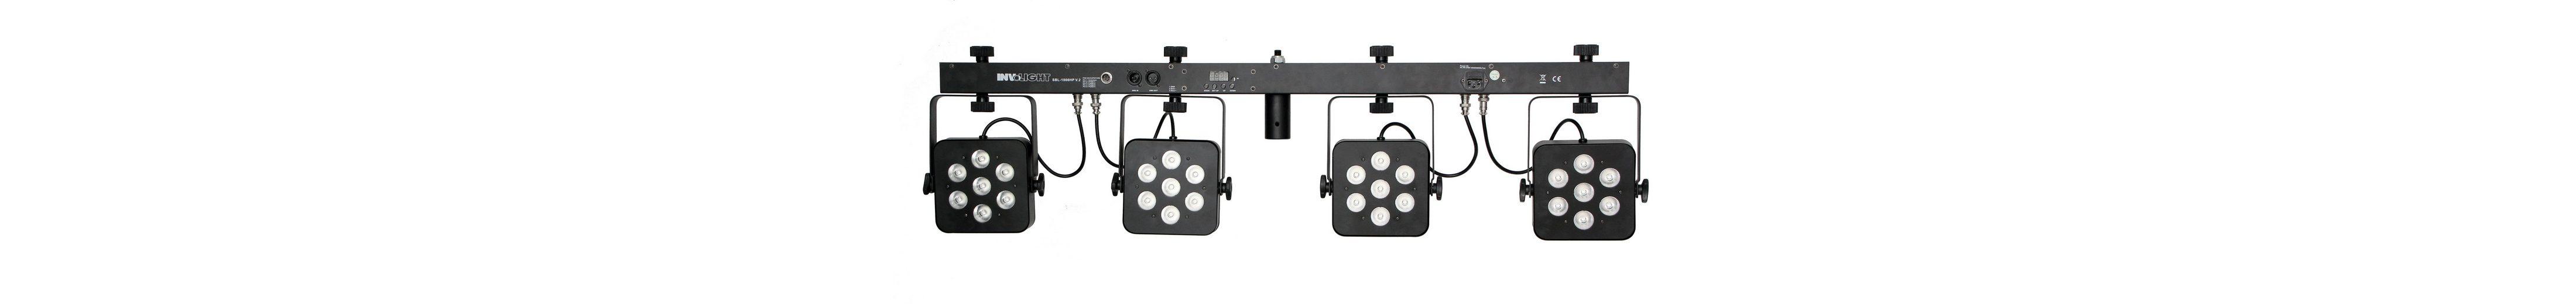 Involight LED-Lichtanlage »SBL1000HP V.2«